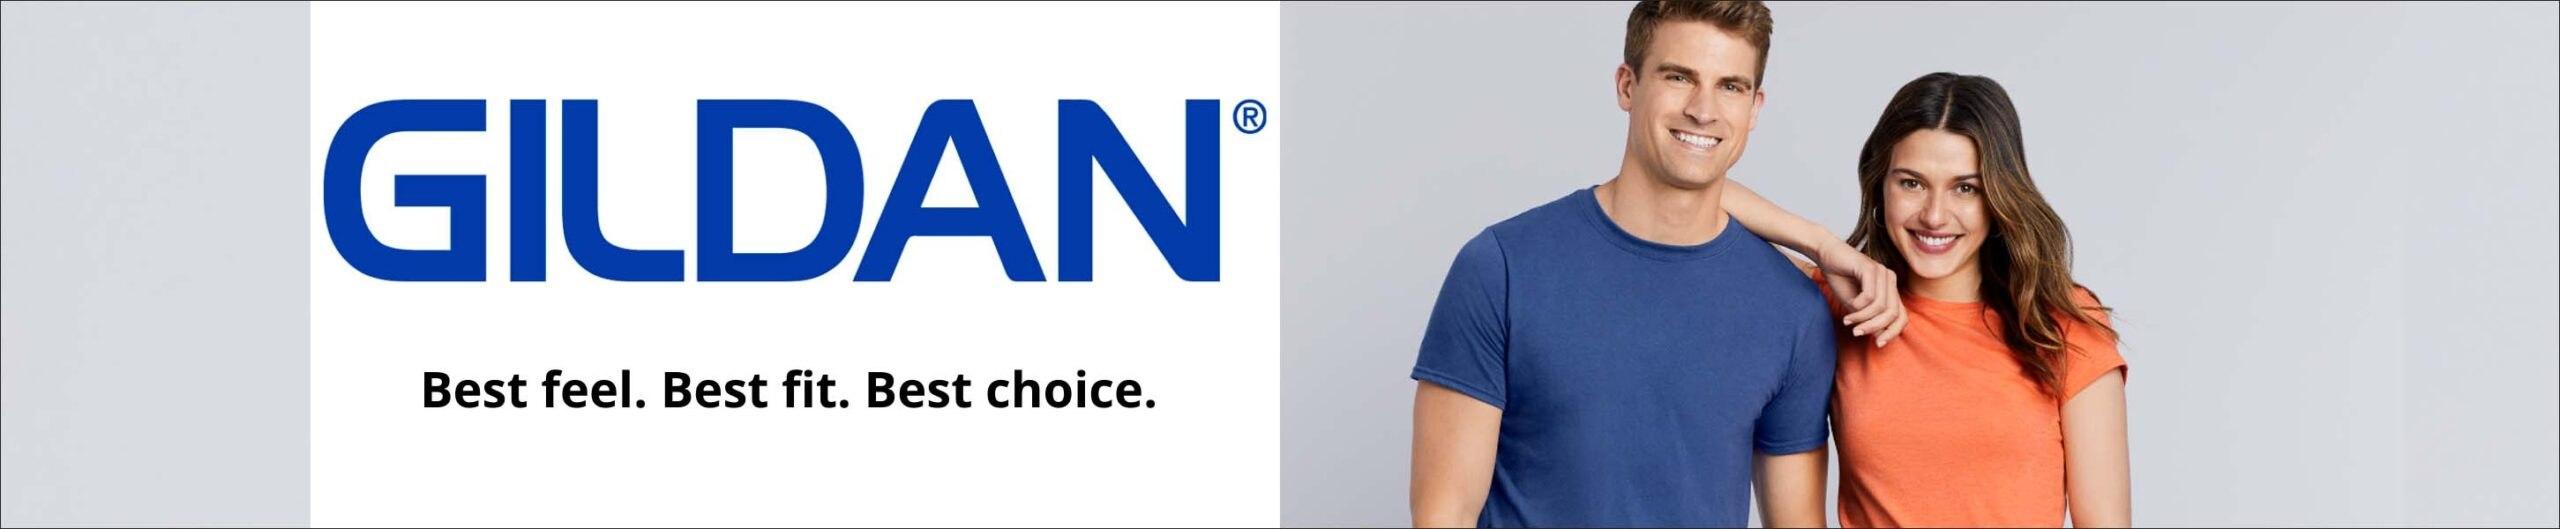 Gildan Banner